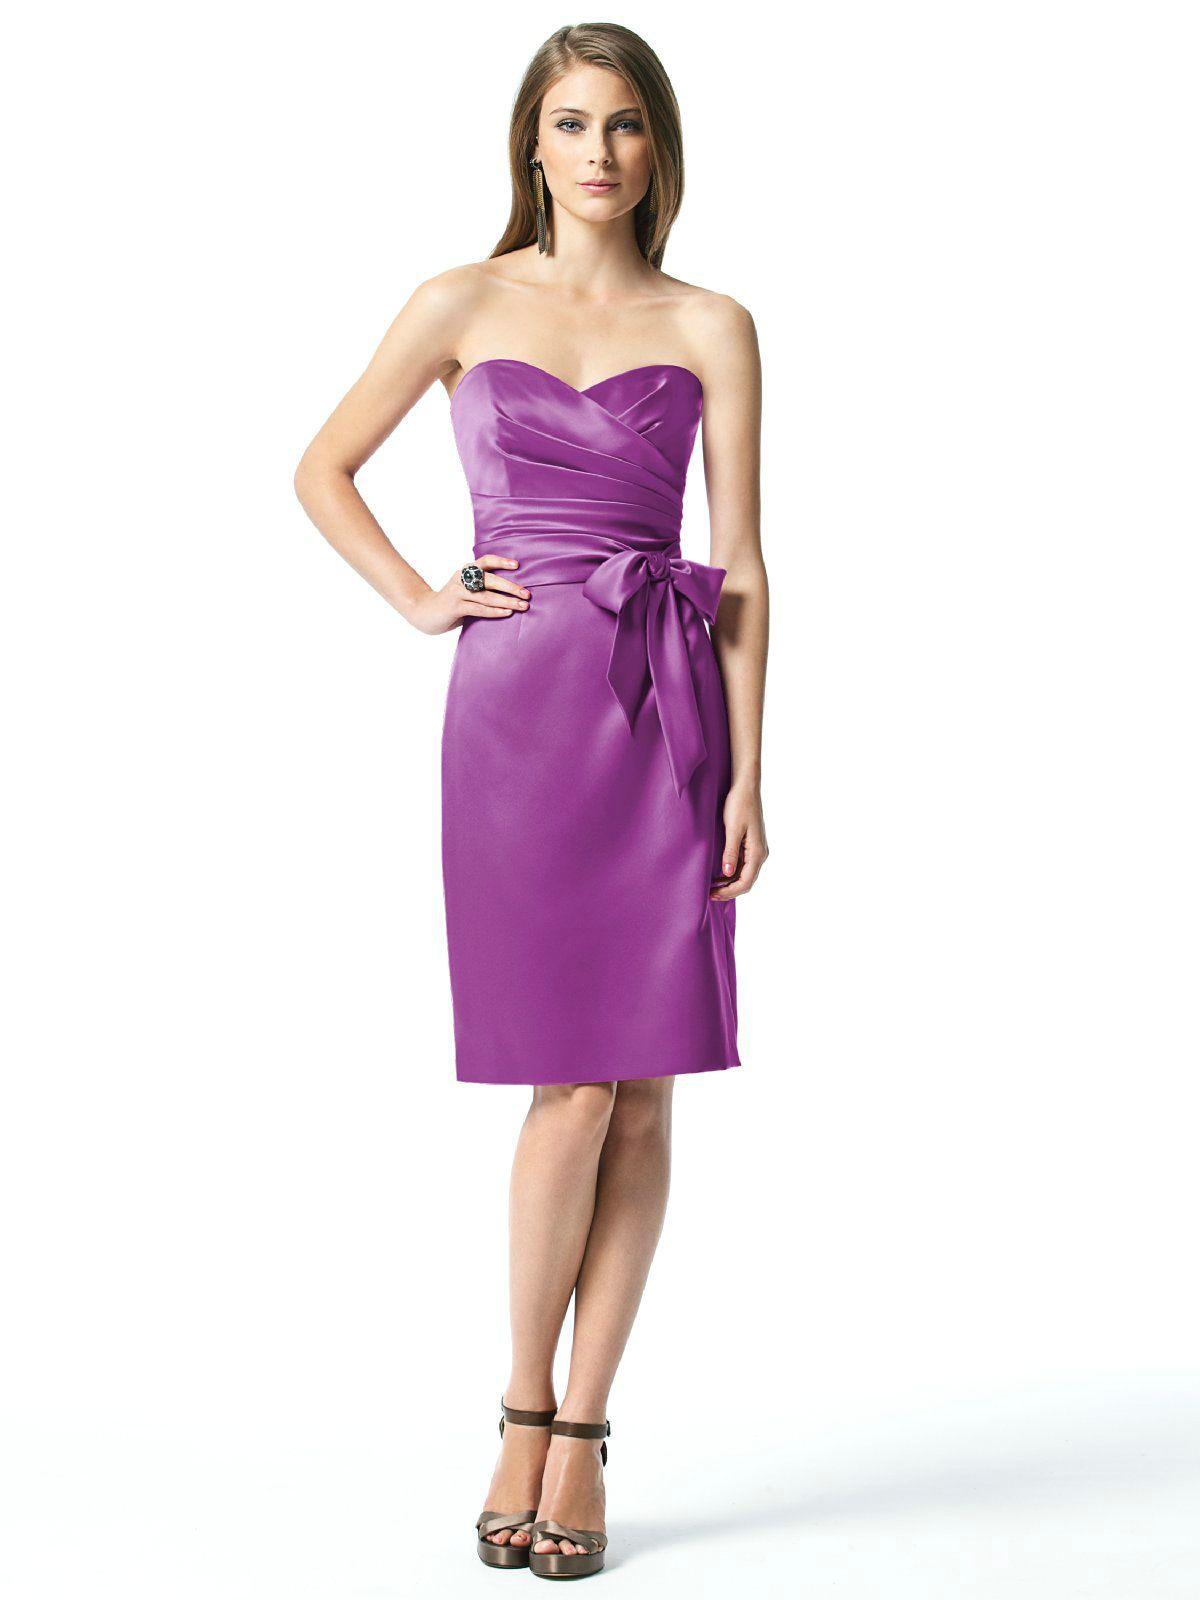 Strapless purple bridesmaid dress strapless purple bridesmaid